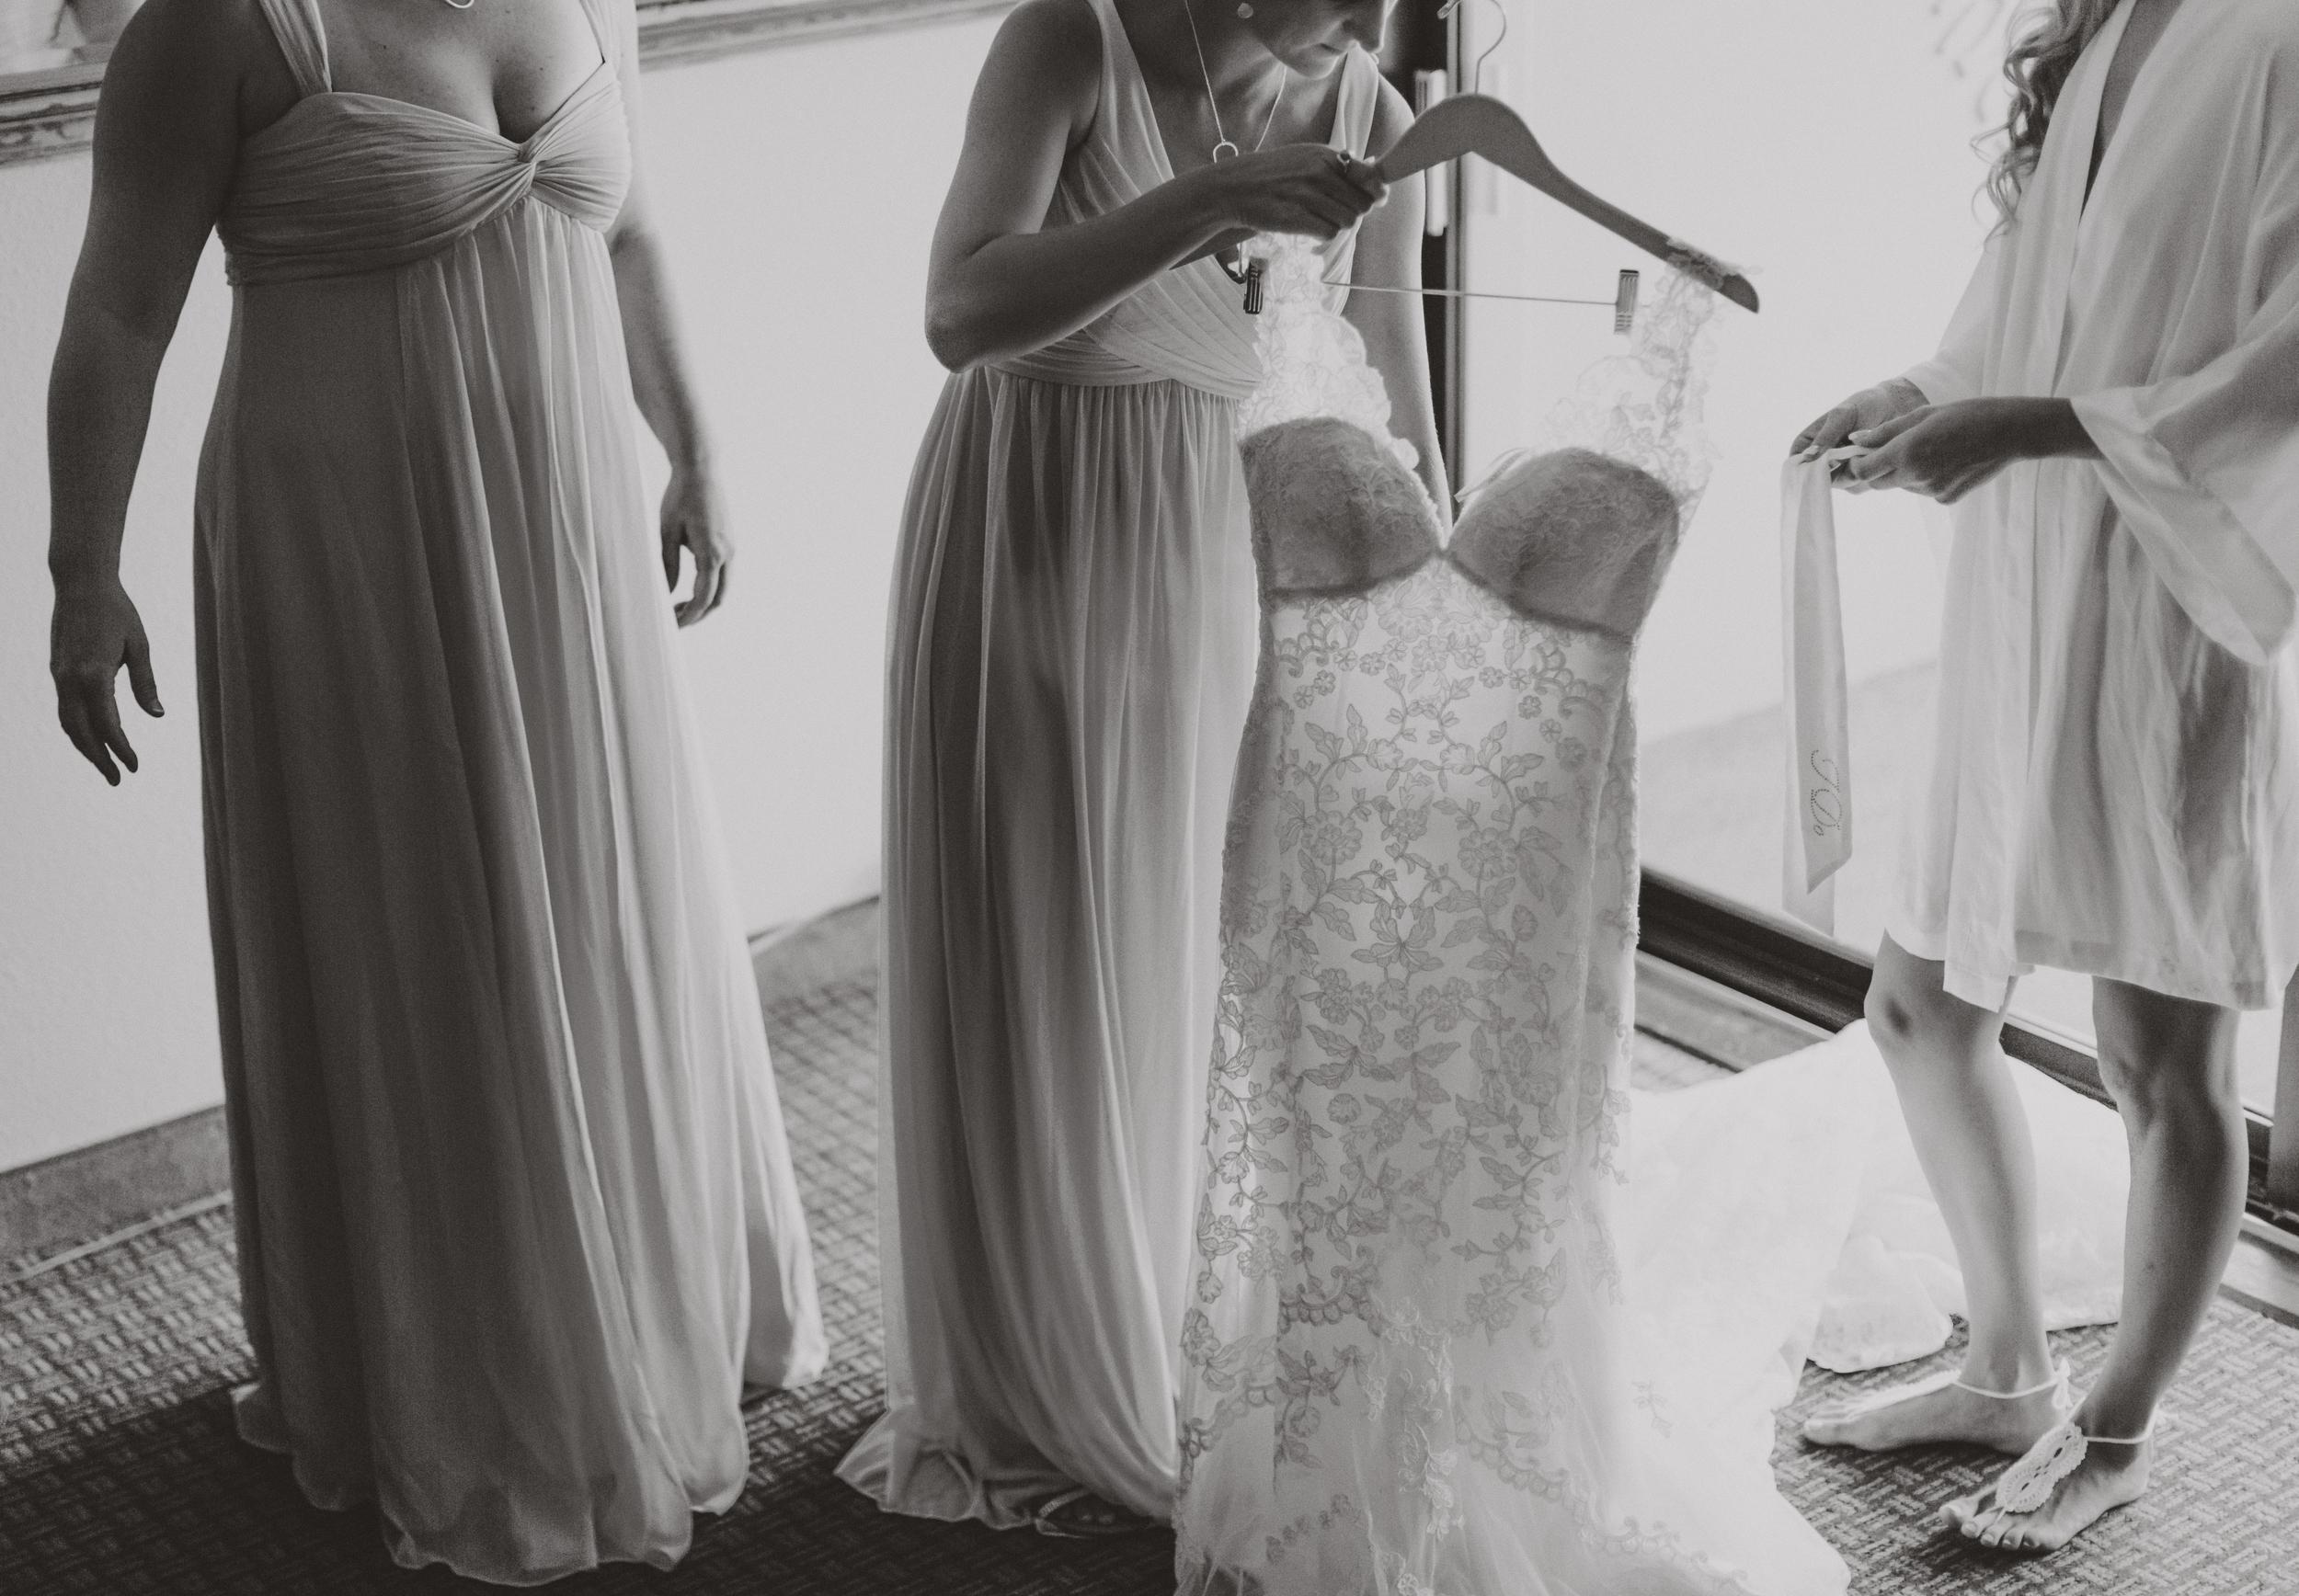 angie-diaz-photography-hawaii-wedding-photographer-kelli-jay-12.jpg